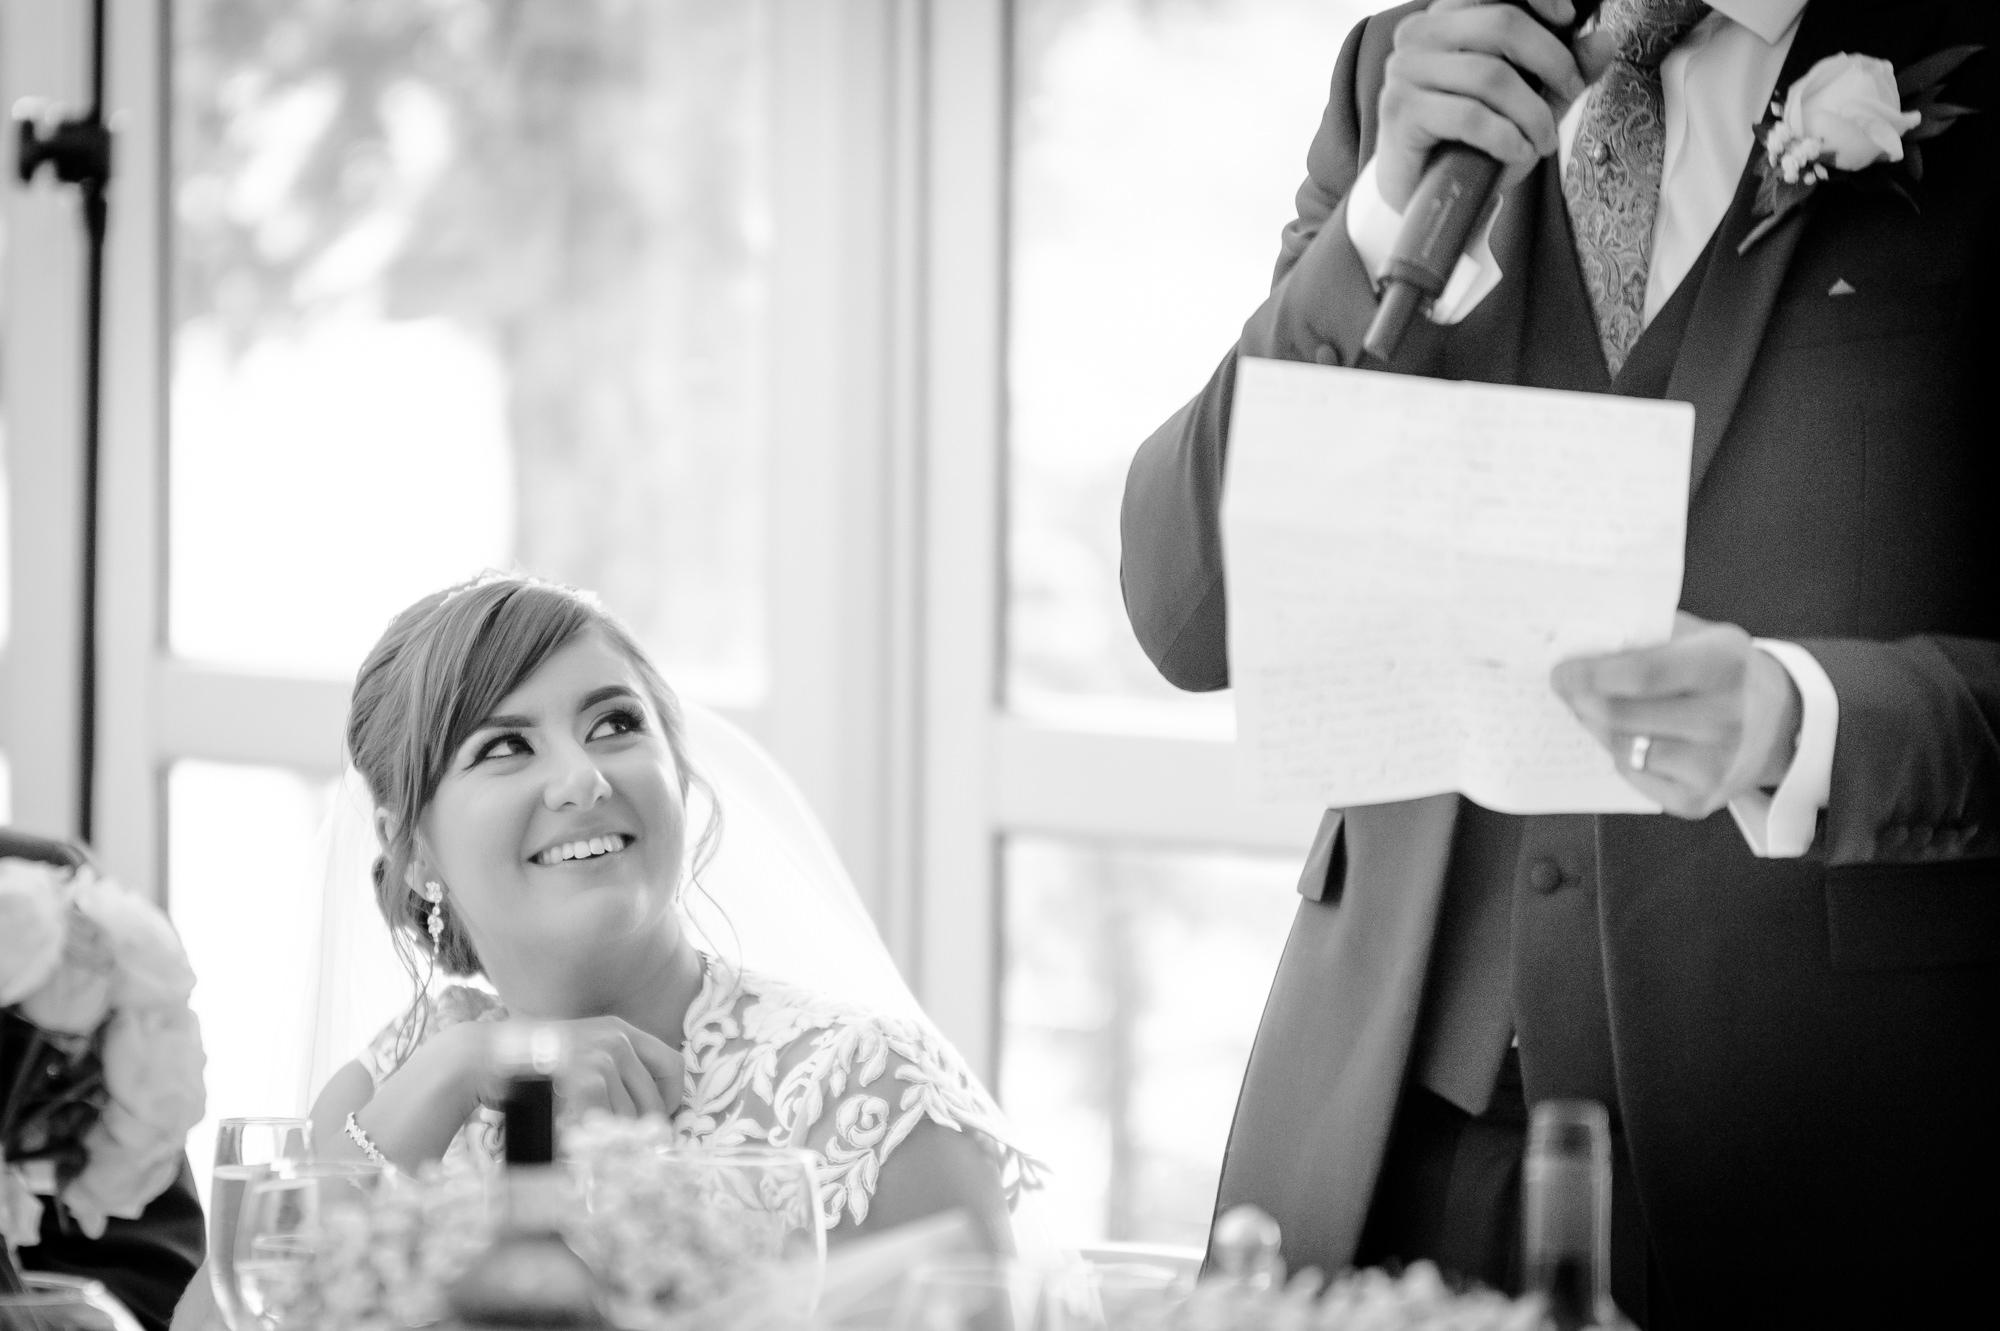 bride listening to the groom's speech